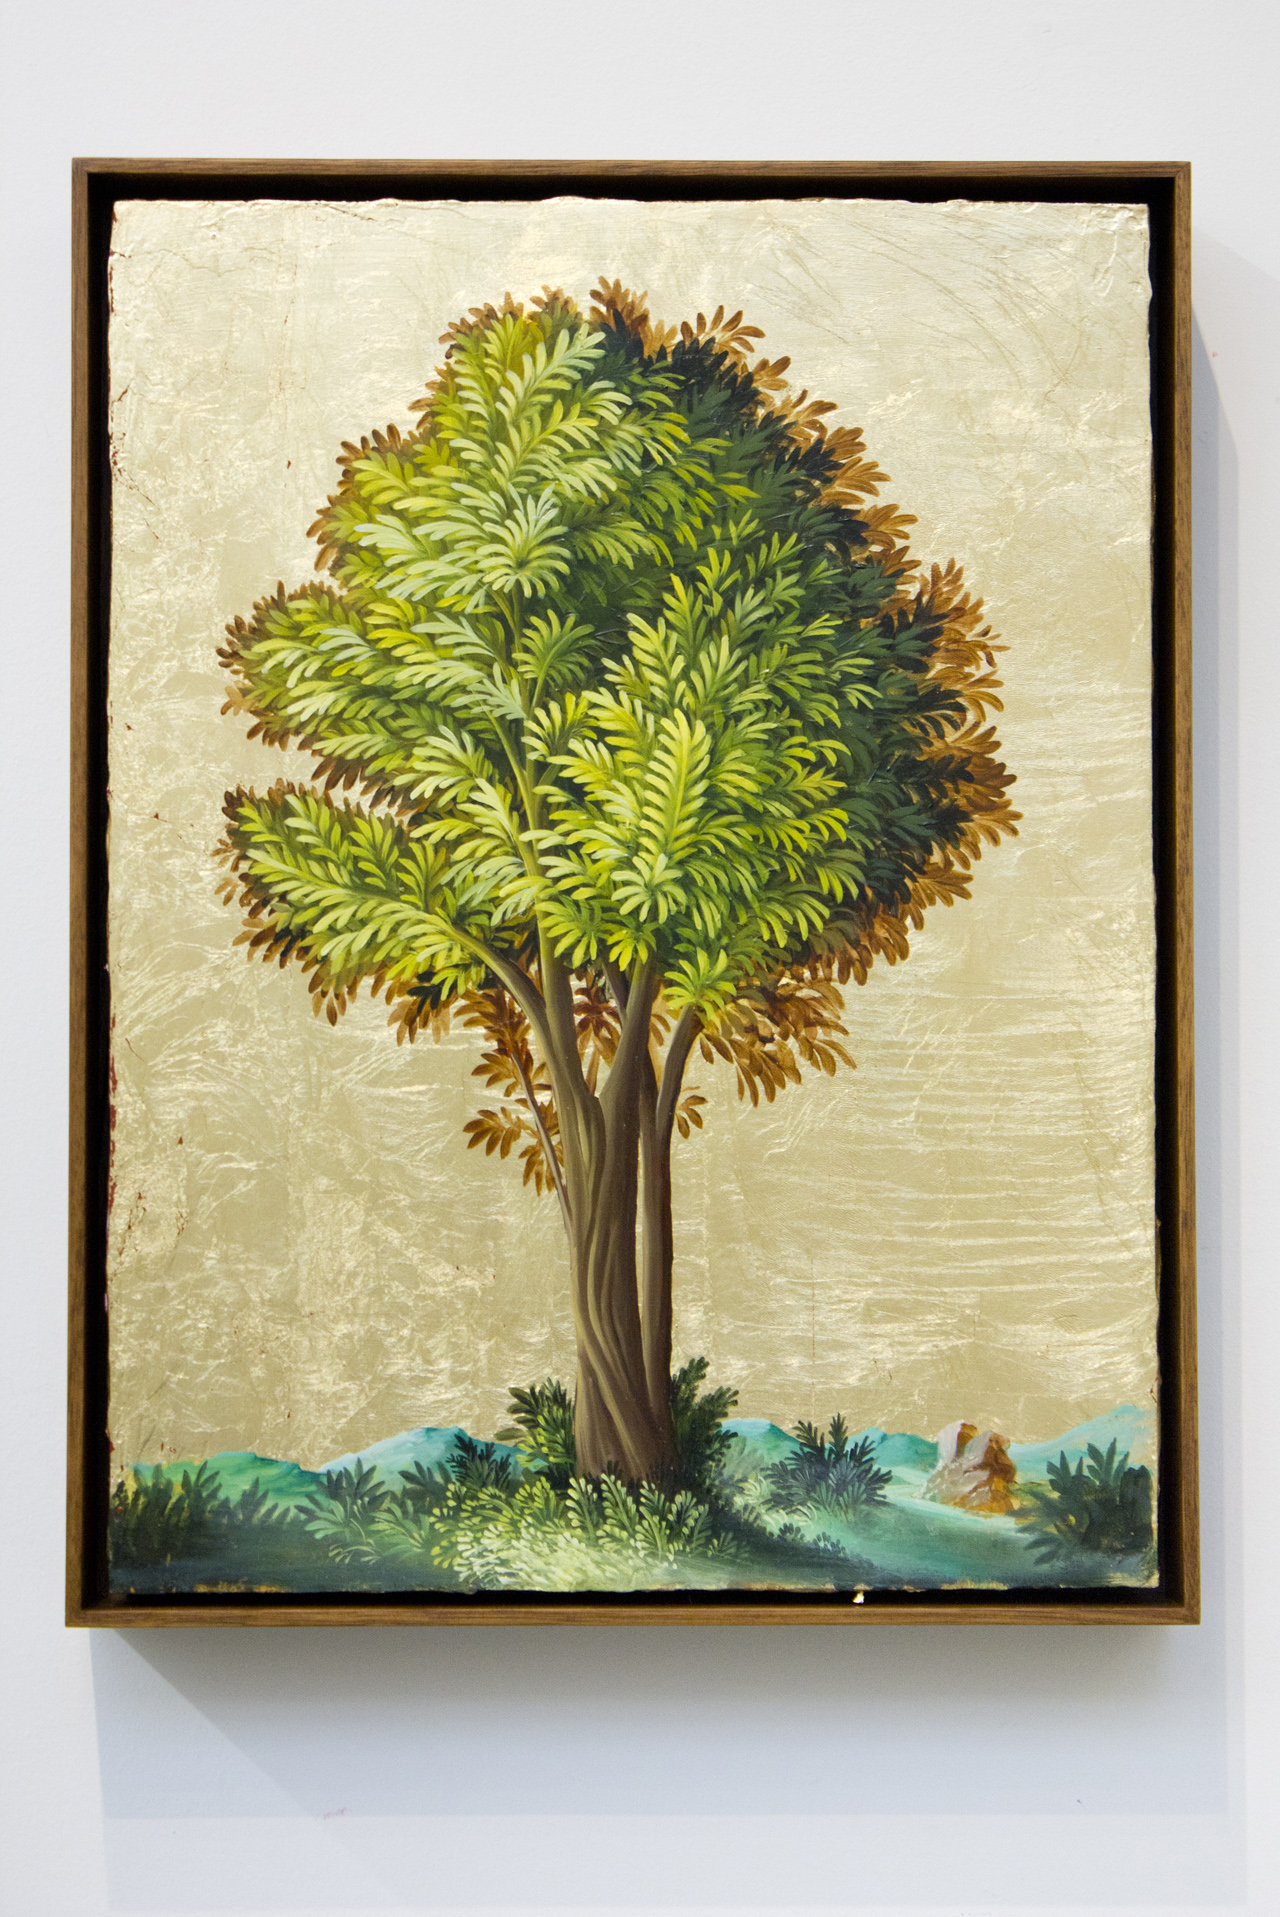 PETER DAVERINGTON   Portrait of a Tree #2  2017 Oil and gold leaf on panel 41 x 31 cm Frame: 43 x 33 cm